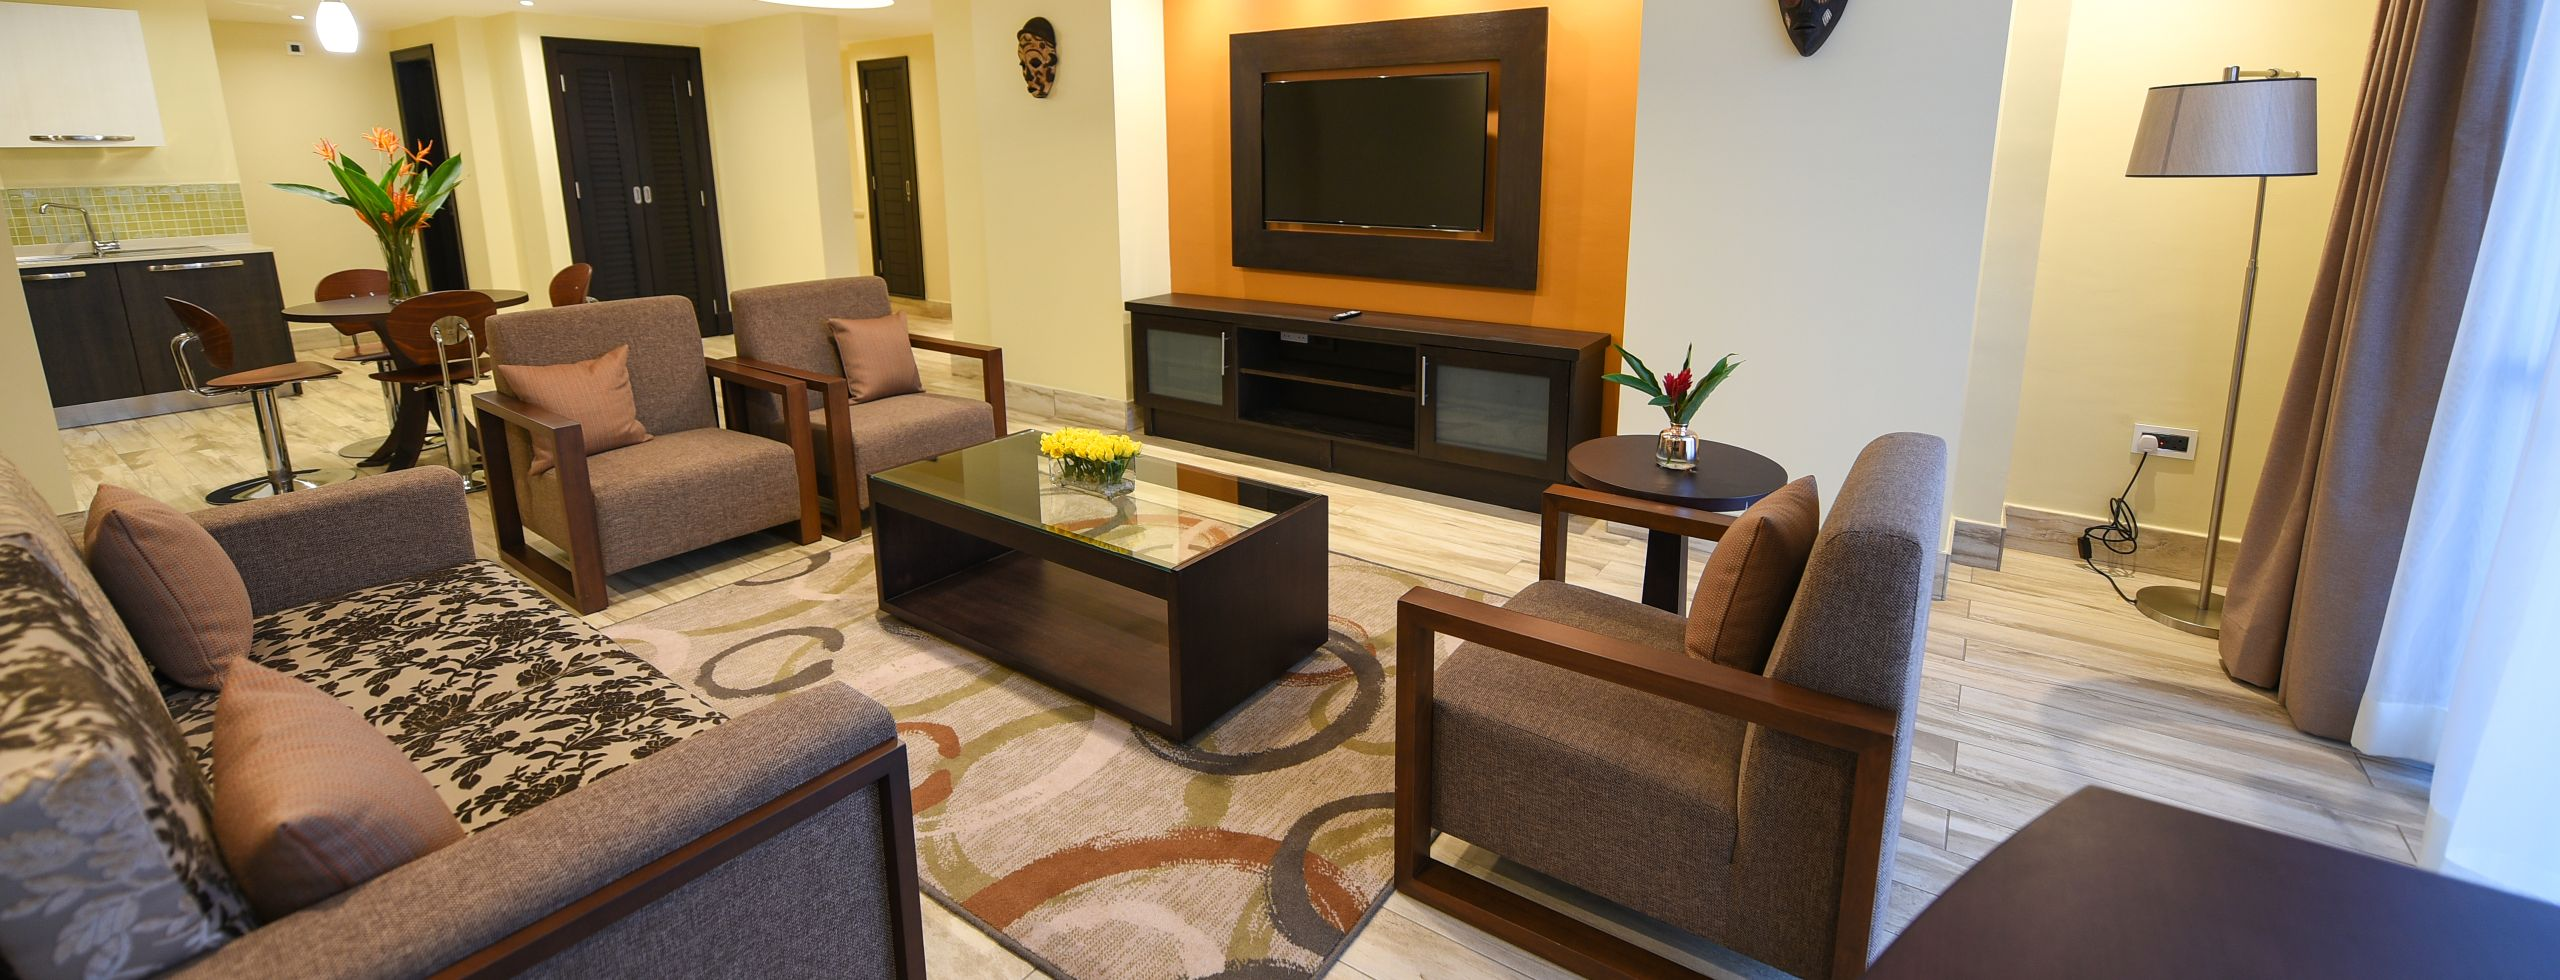 Accommodation 2 bed 3 lounge